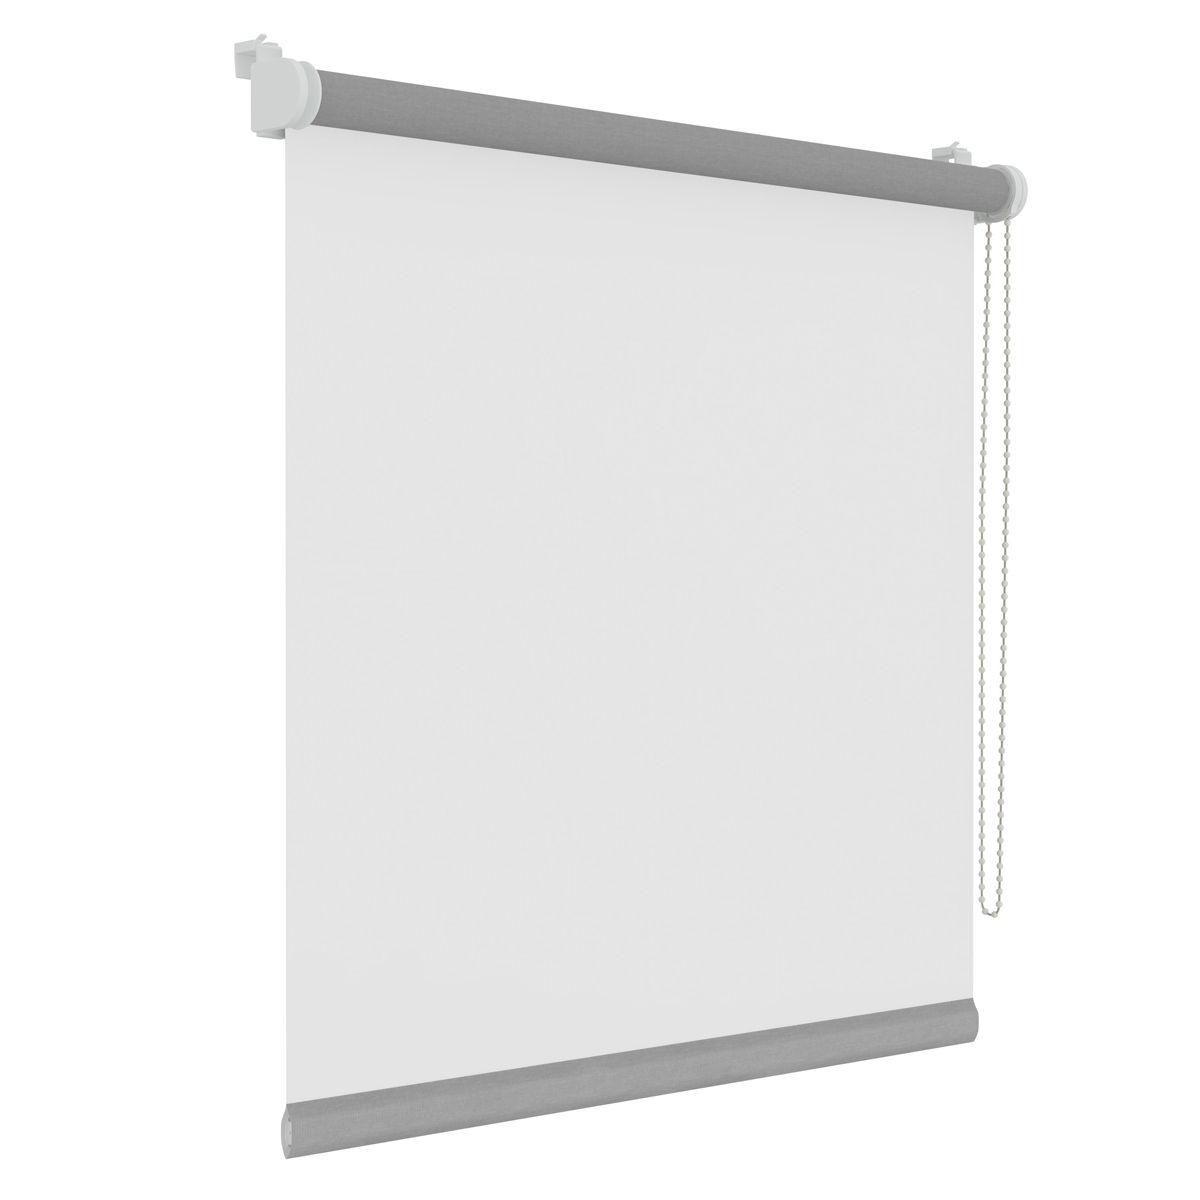 Store enrouleur Myrdall blanc 52x160cm